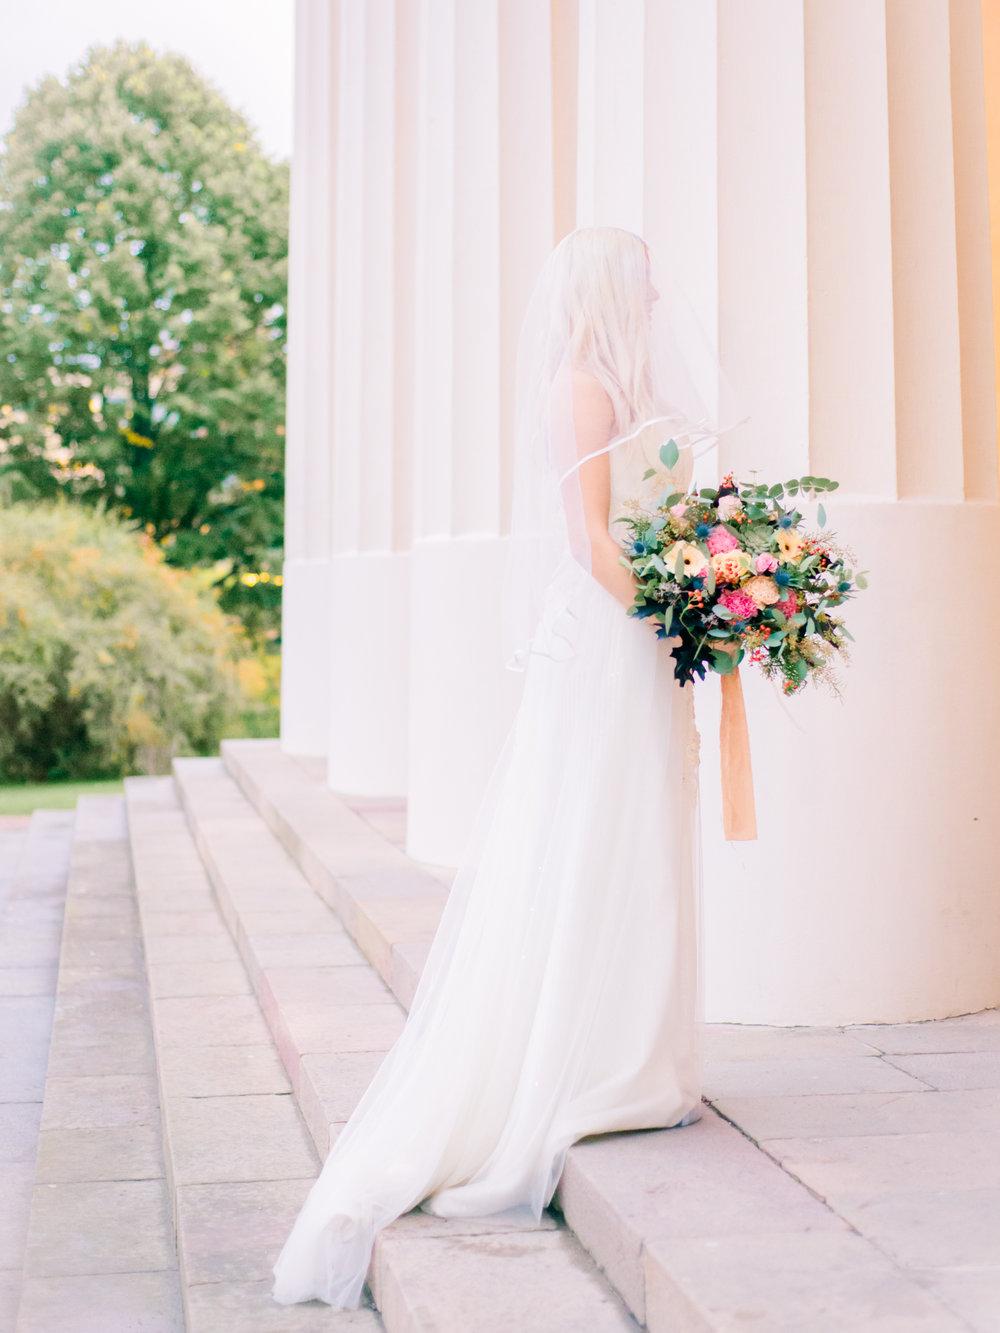 Elegant Organic Fall Swedish Bridal Wedding Styled Shoot - Erika Alvarenga Photography-69.jpg